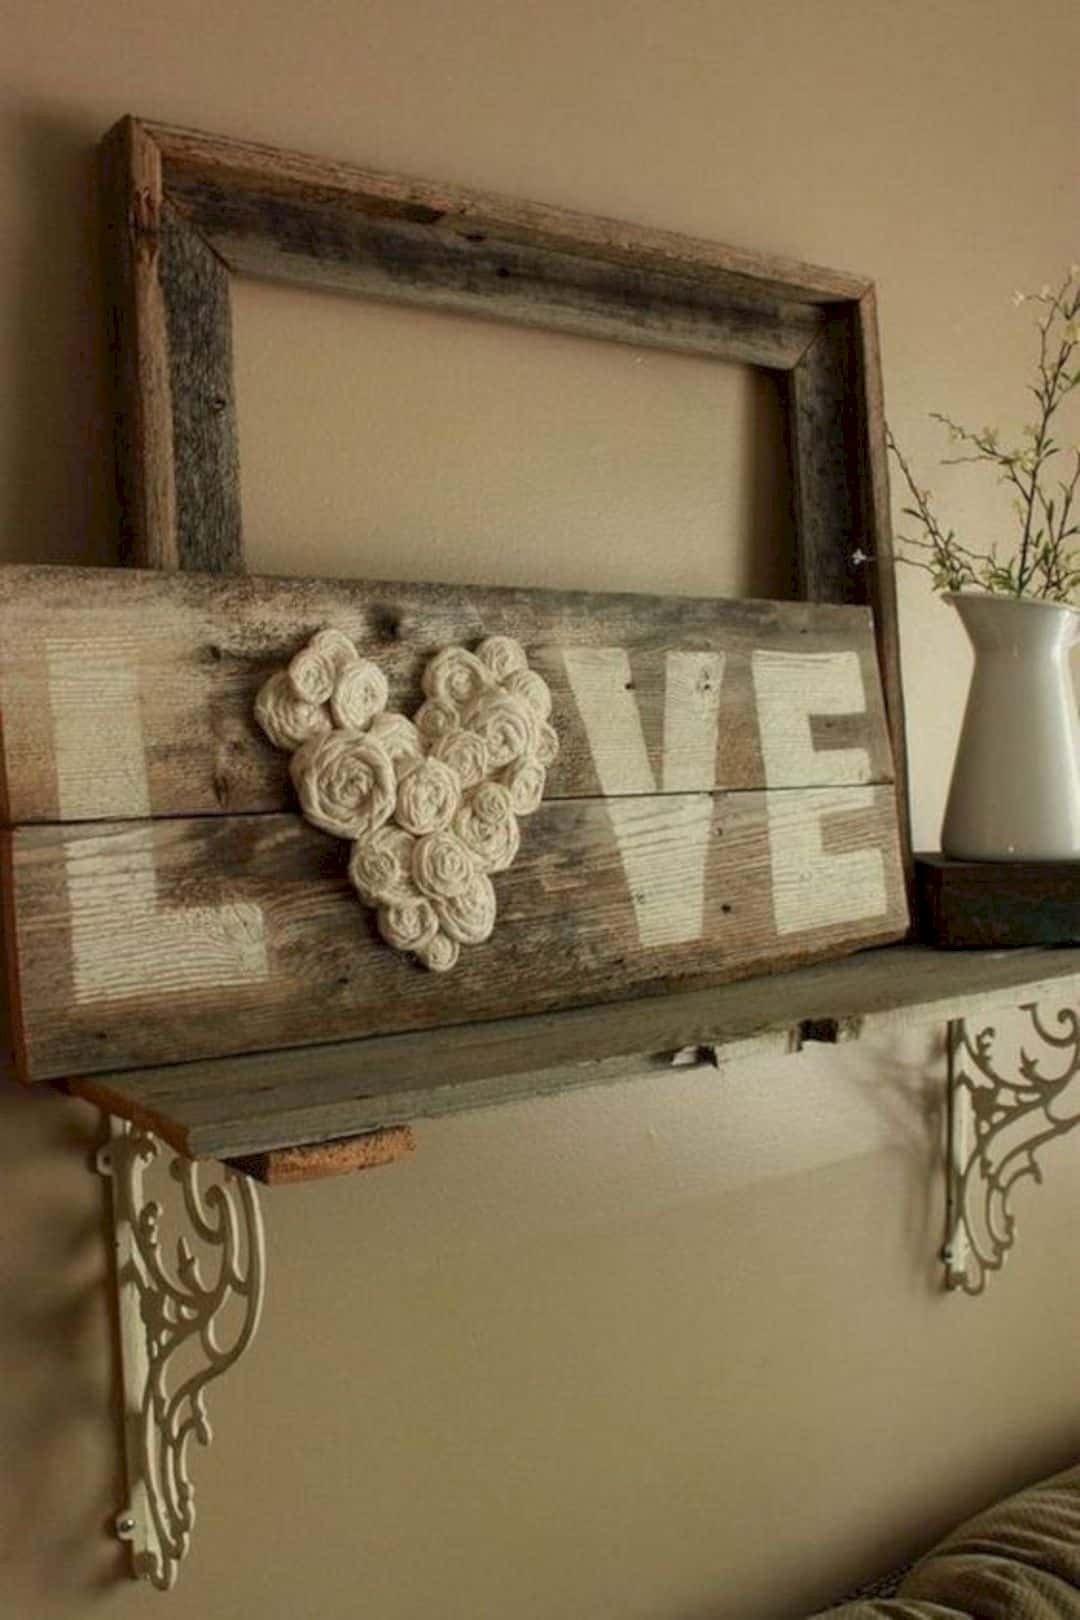 Diy Rustic Living Room Decor Elegant 17 Diy Rustic Home Decor Ideas for Living Room